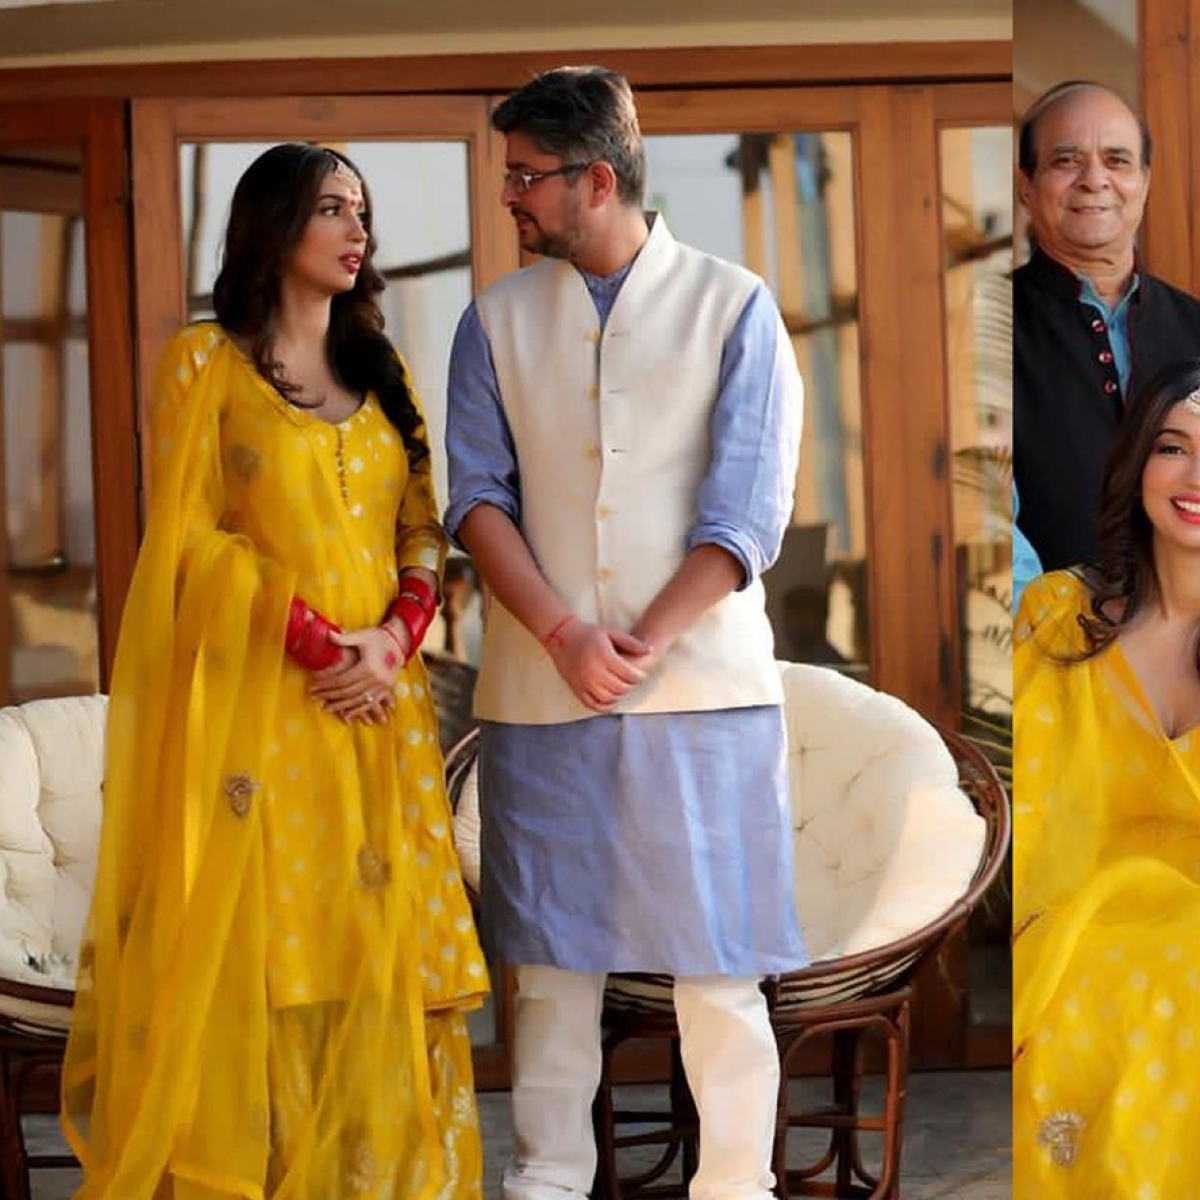 'Kedarnath' screenwriter Kanika Dhillon to marry second time with 'Raanjhanaa' writer Himanshu Sharma